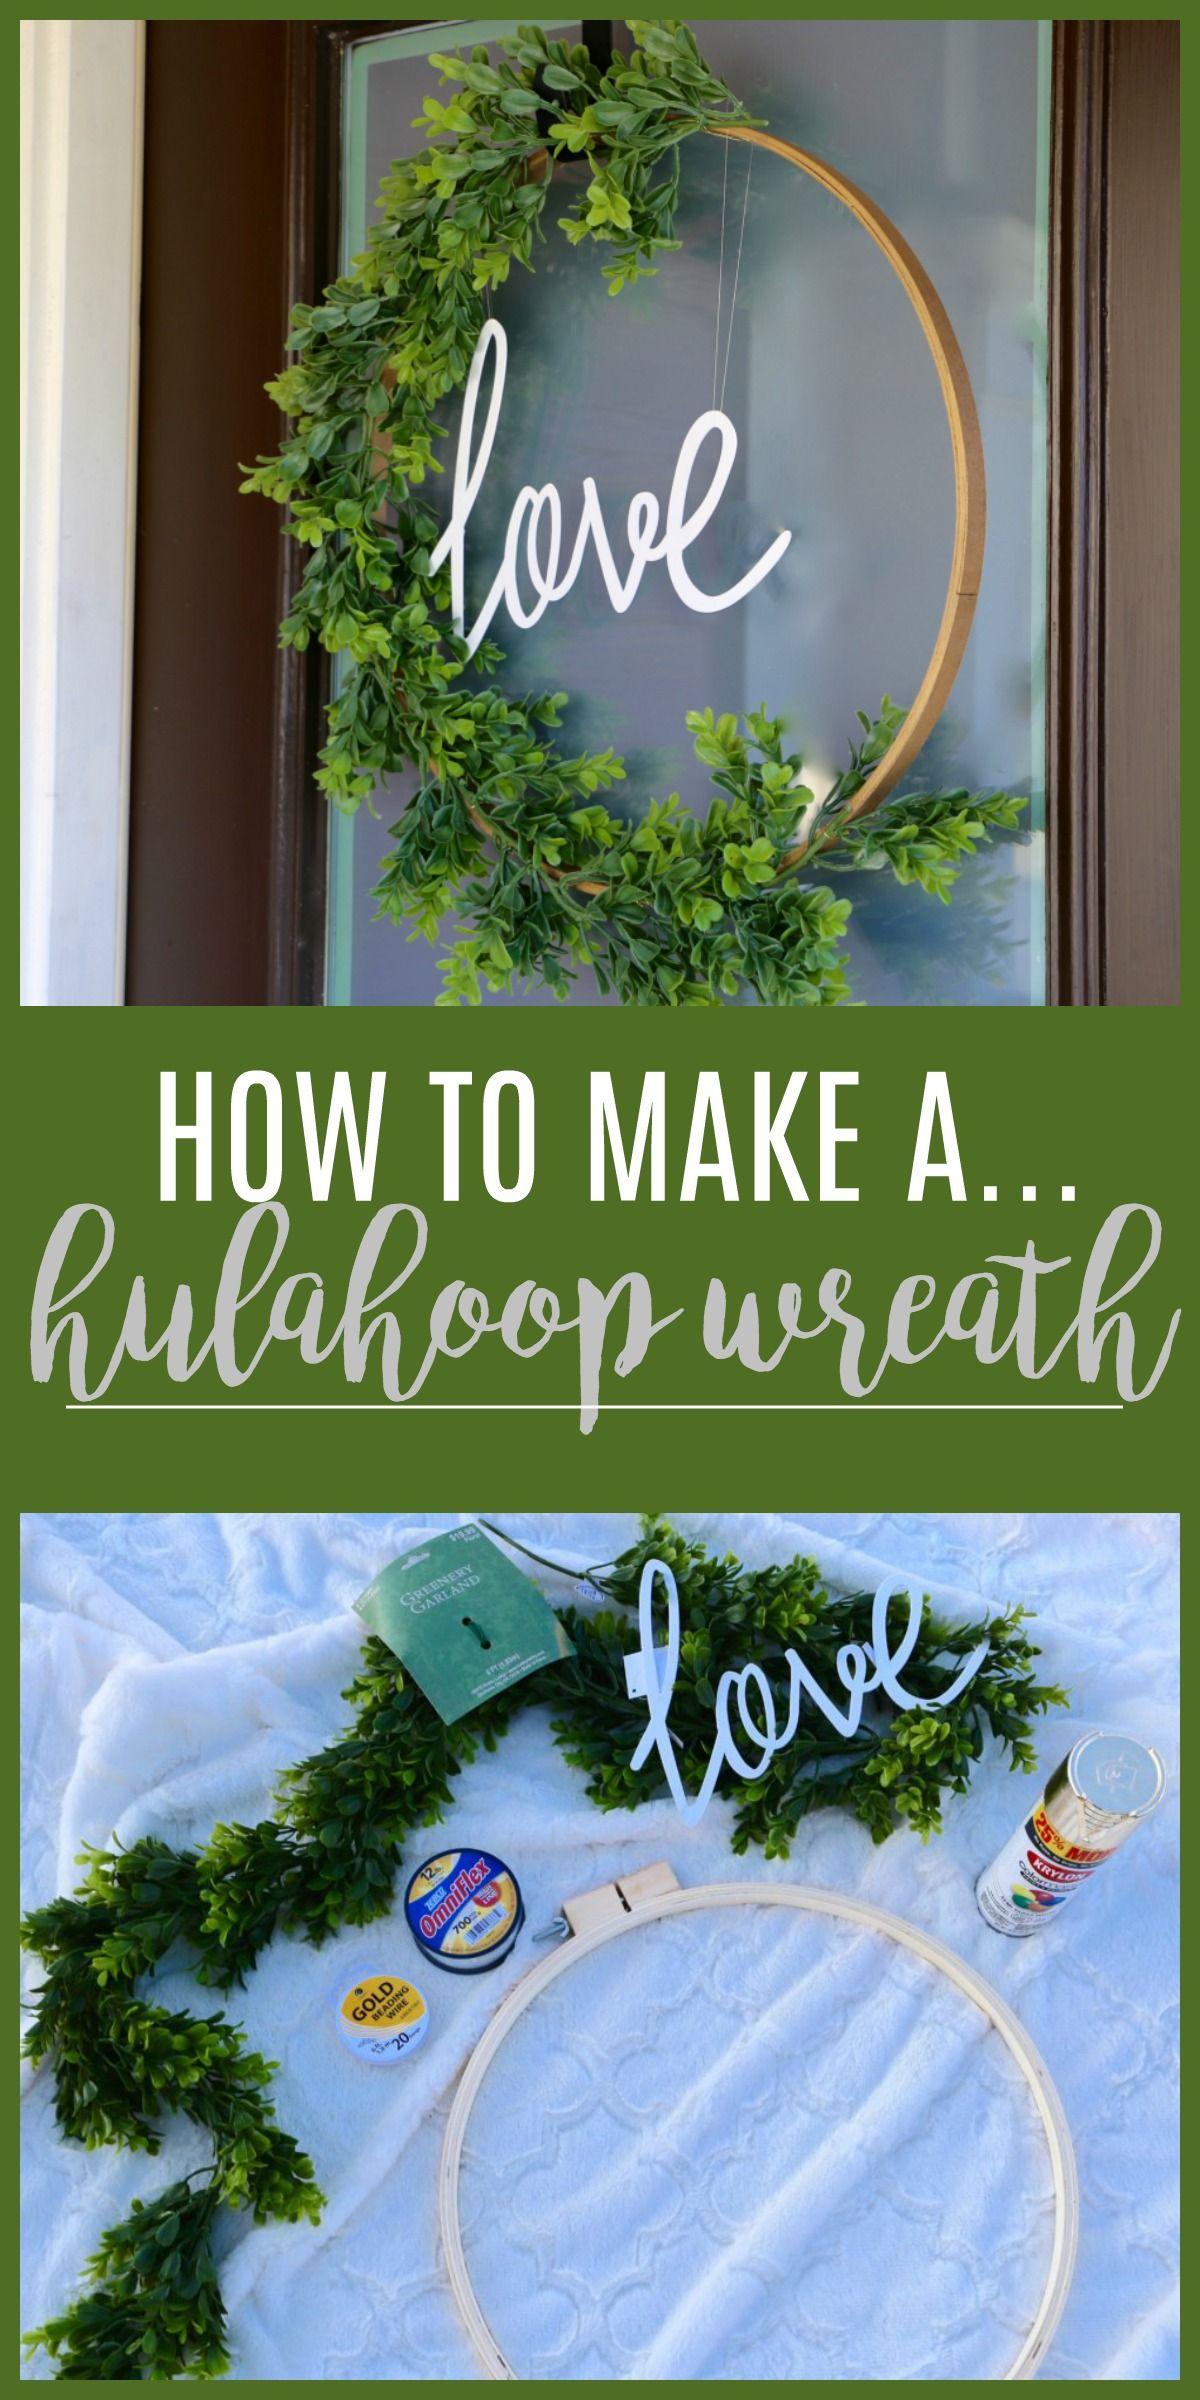 Photo of Weekend hikes | How to make a hula hoop wreath – SheShe Show by Sheree Frede